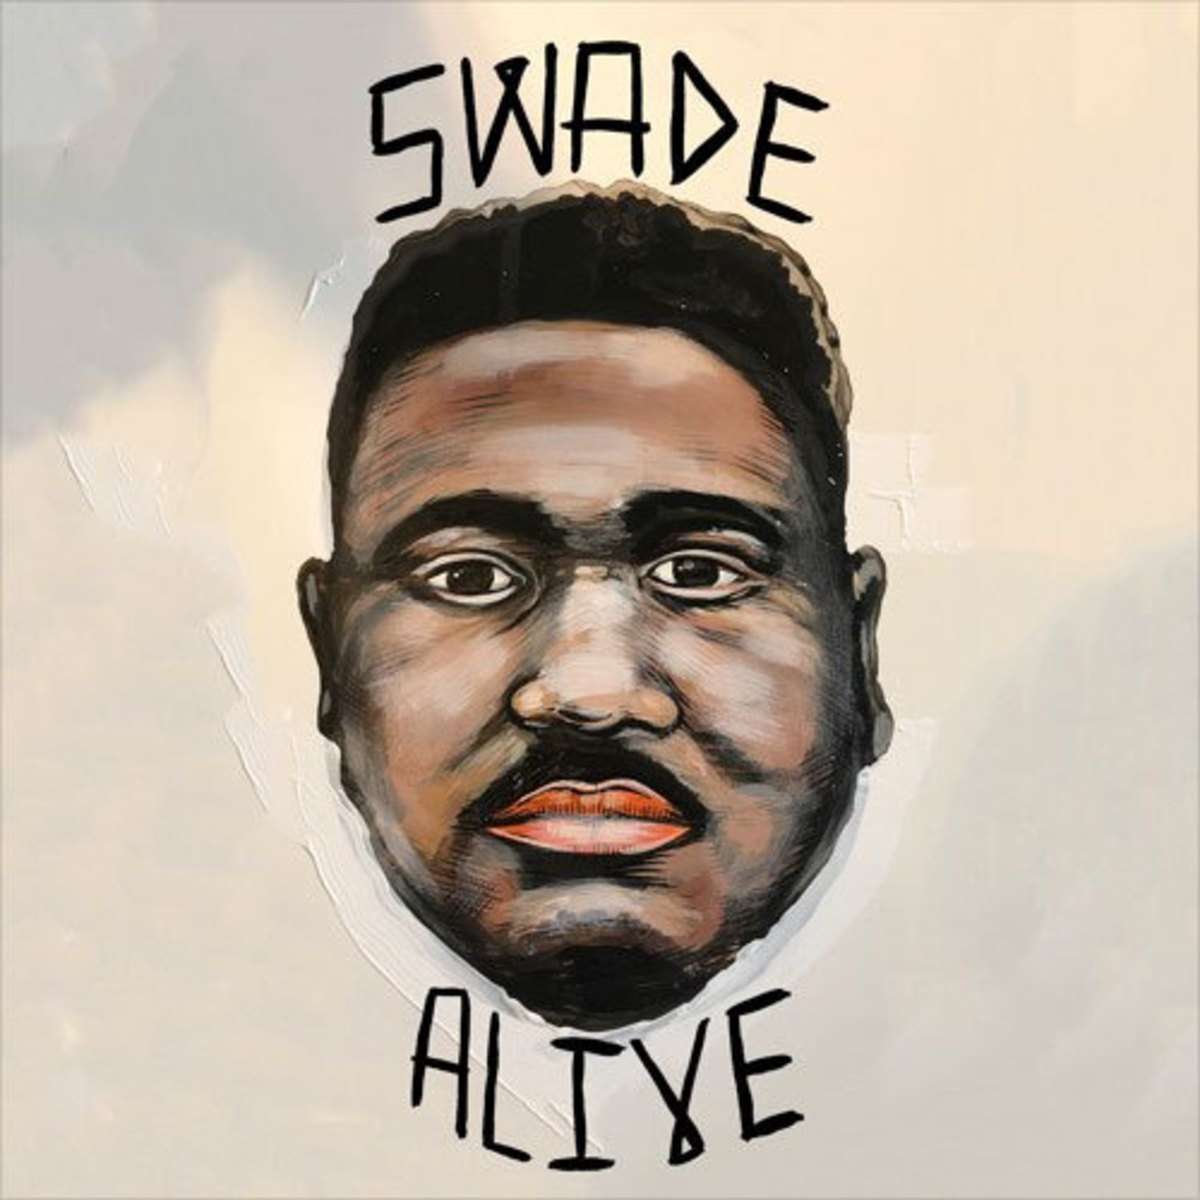 swade-alive.jpg